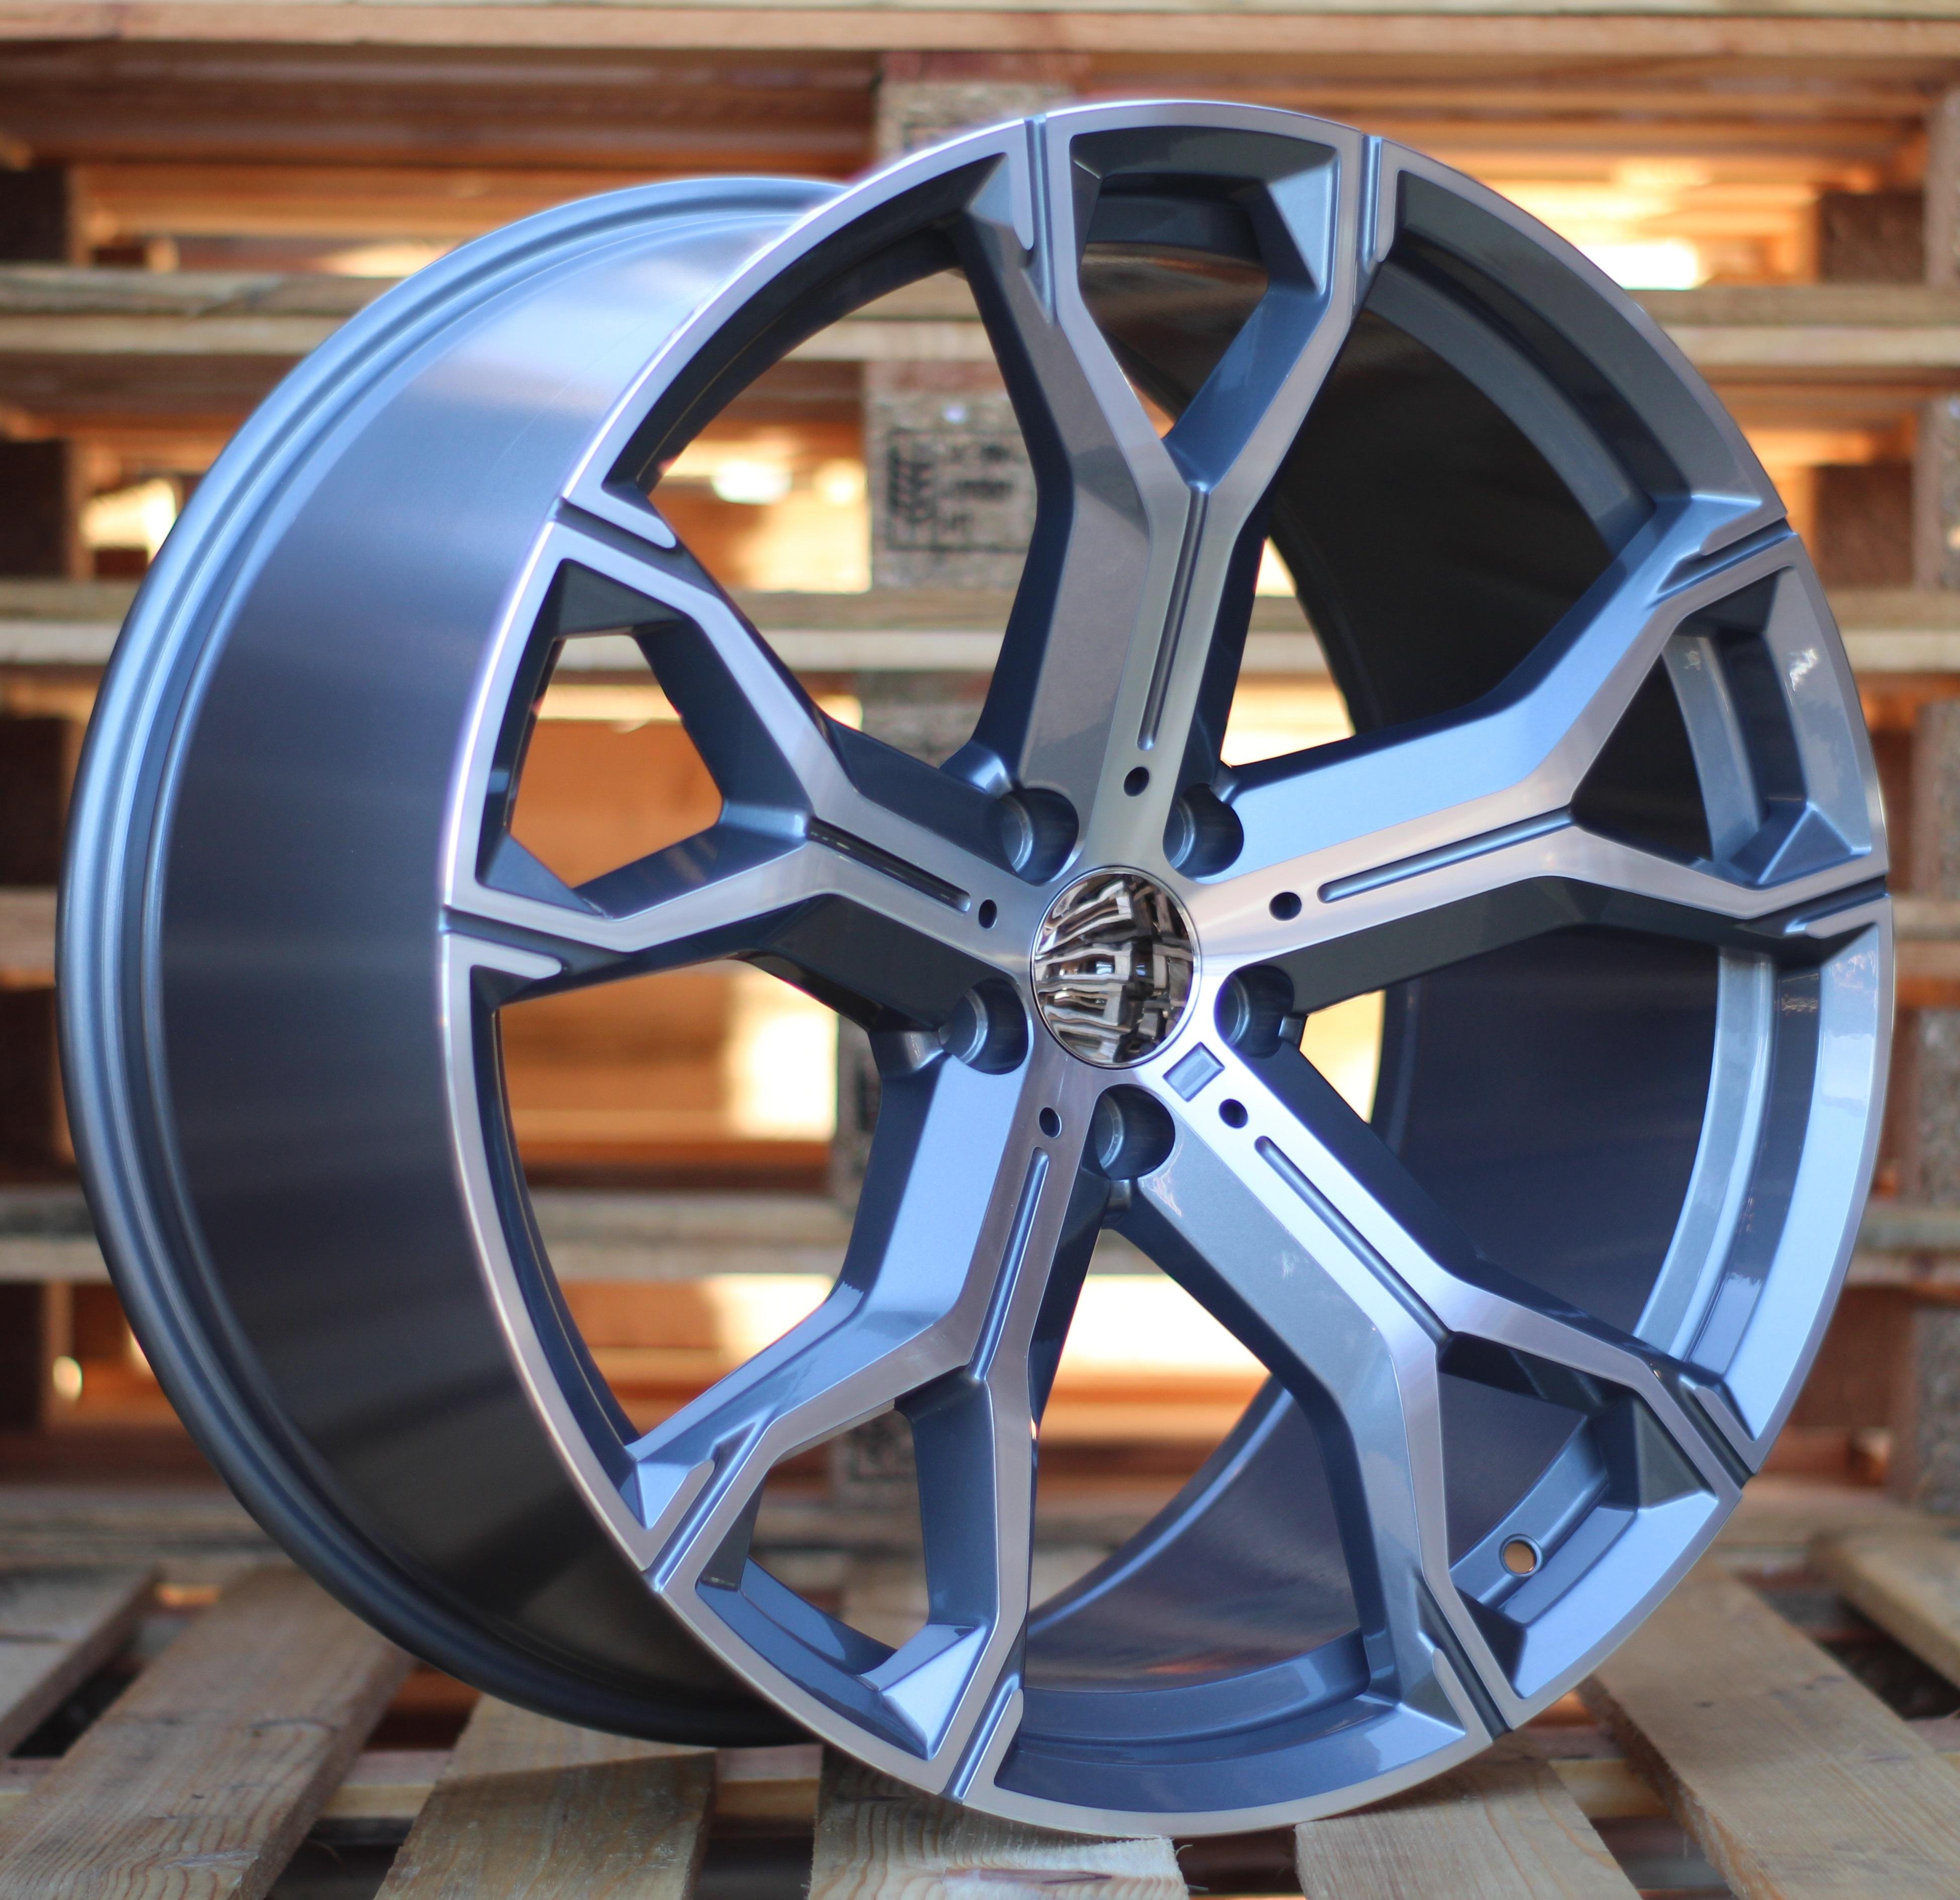 B21X9.5 5x112 ET37 66.5 BK5498 MG+Powder coating (Rear+Front) RWR BM NEW X5 (+5 eur)(P) 9.5x21 ET37 5x112